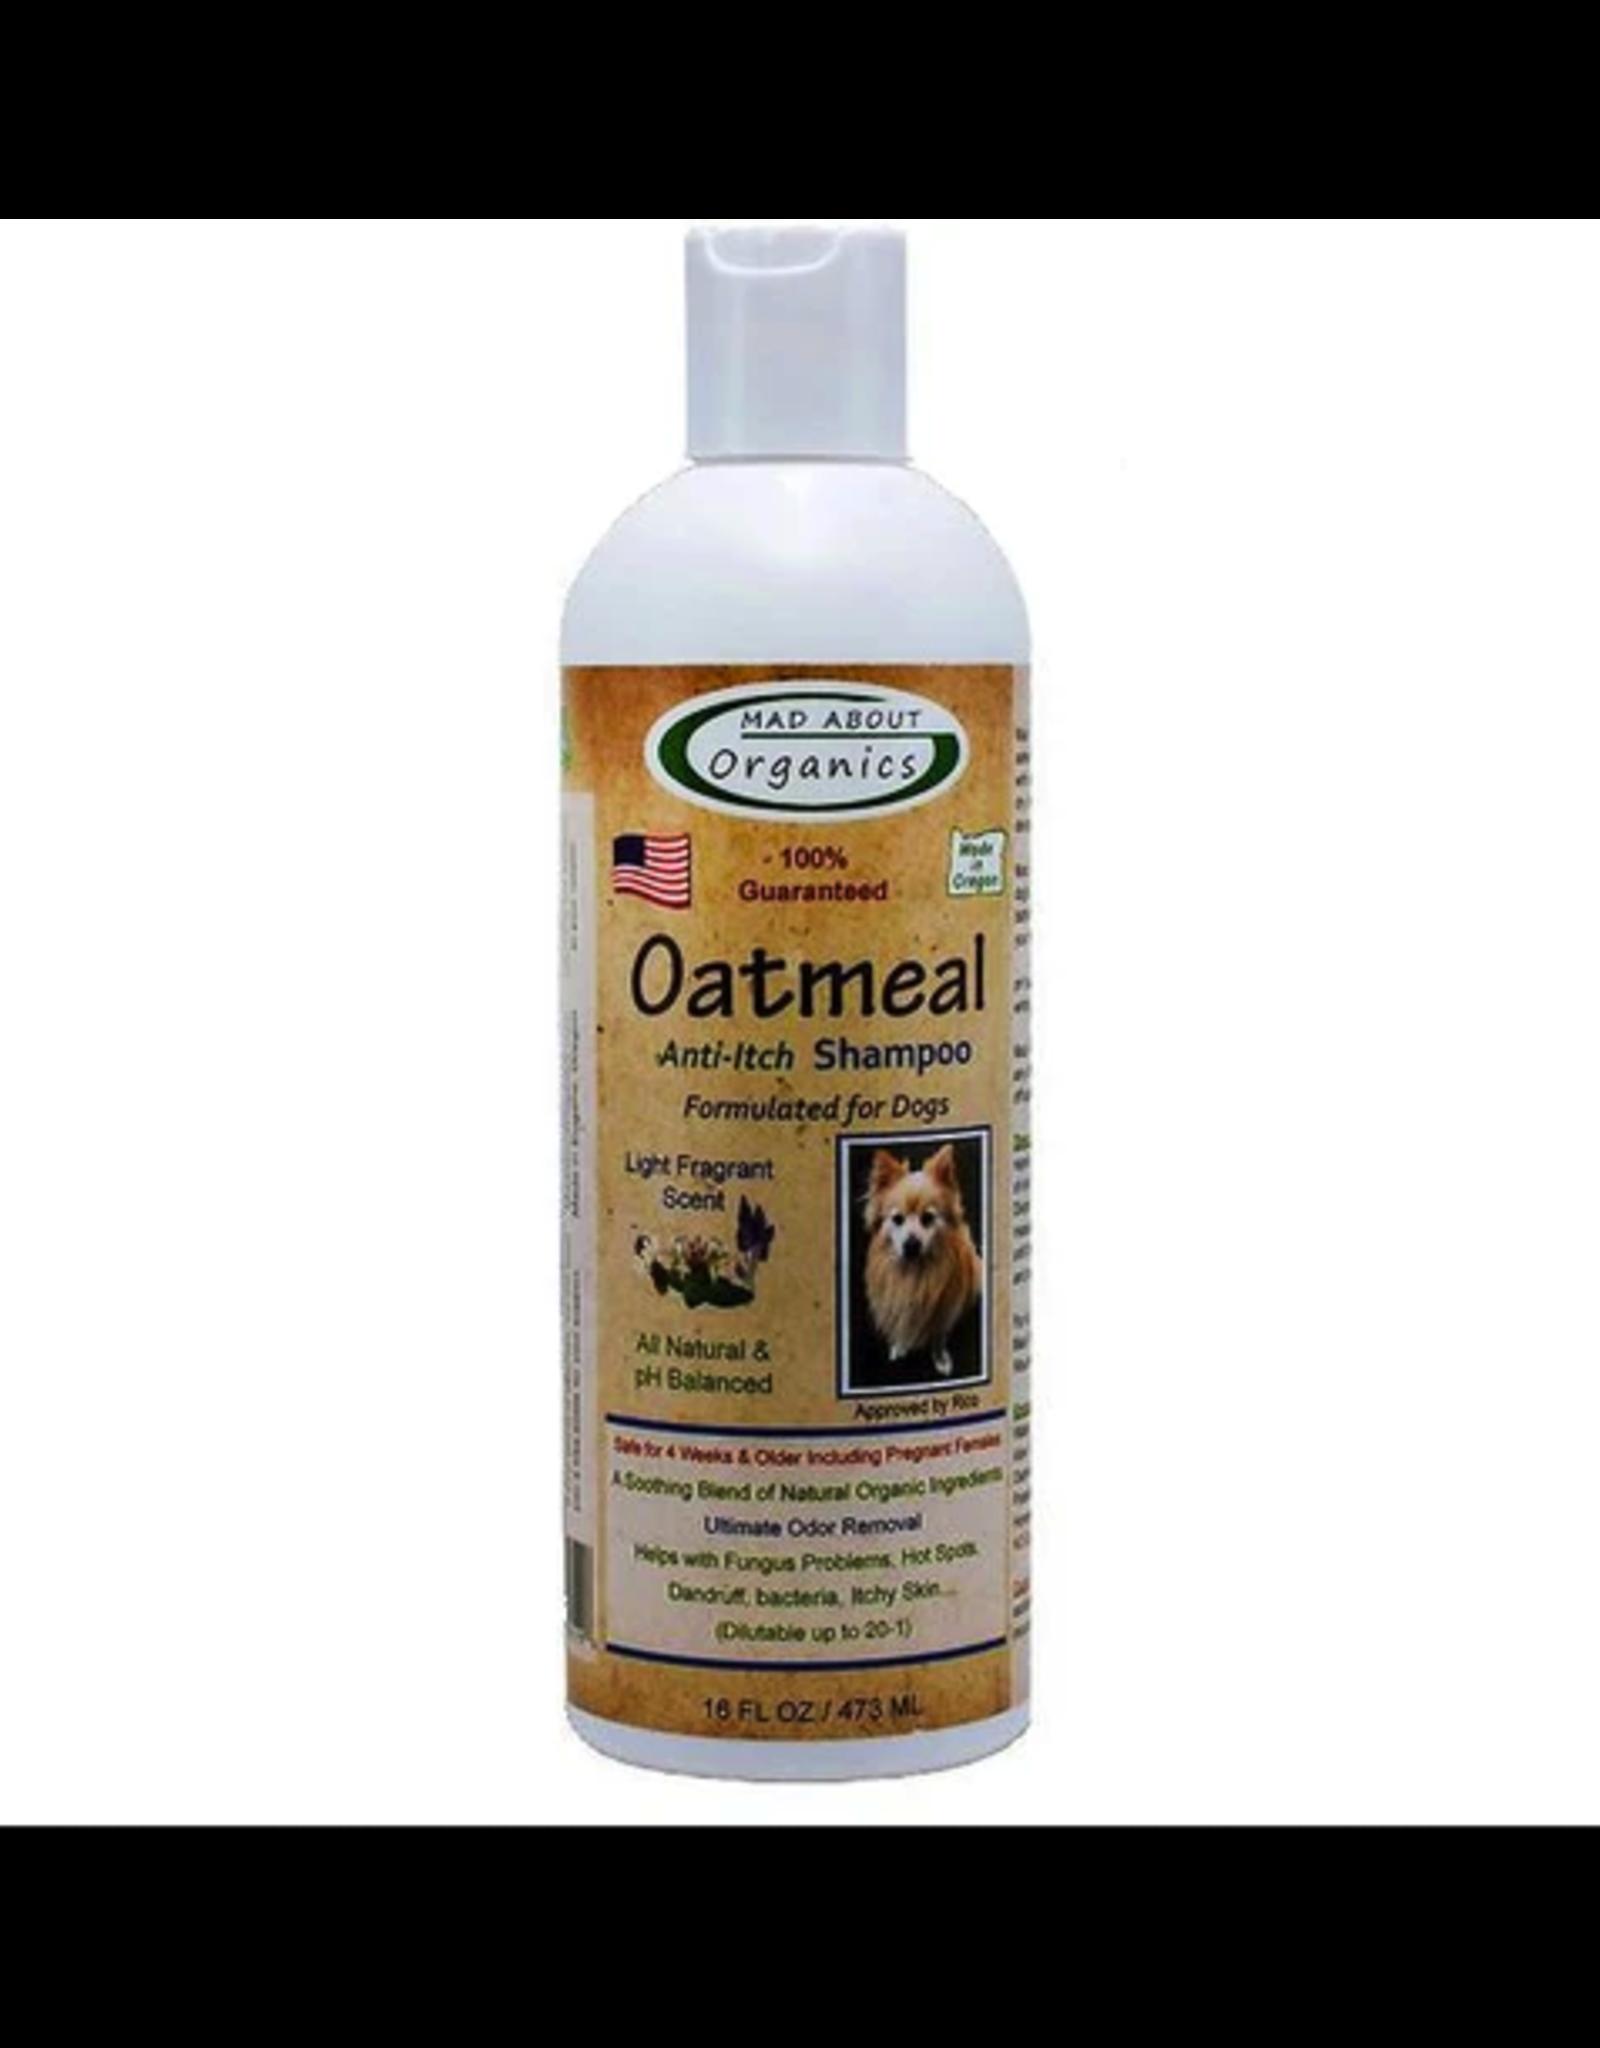 Mad About Organics Mad About Organics Dog Oatmeal Shampoo 16oz